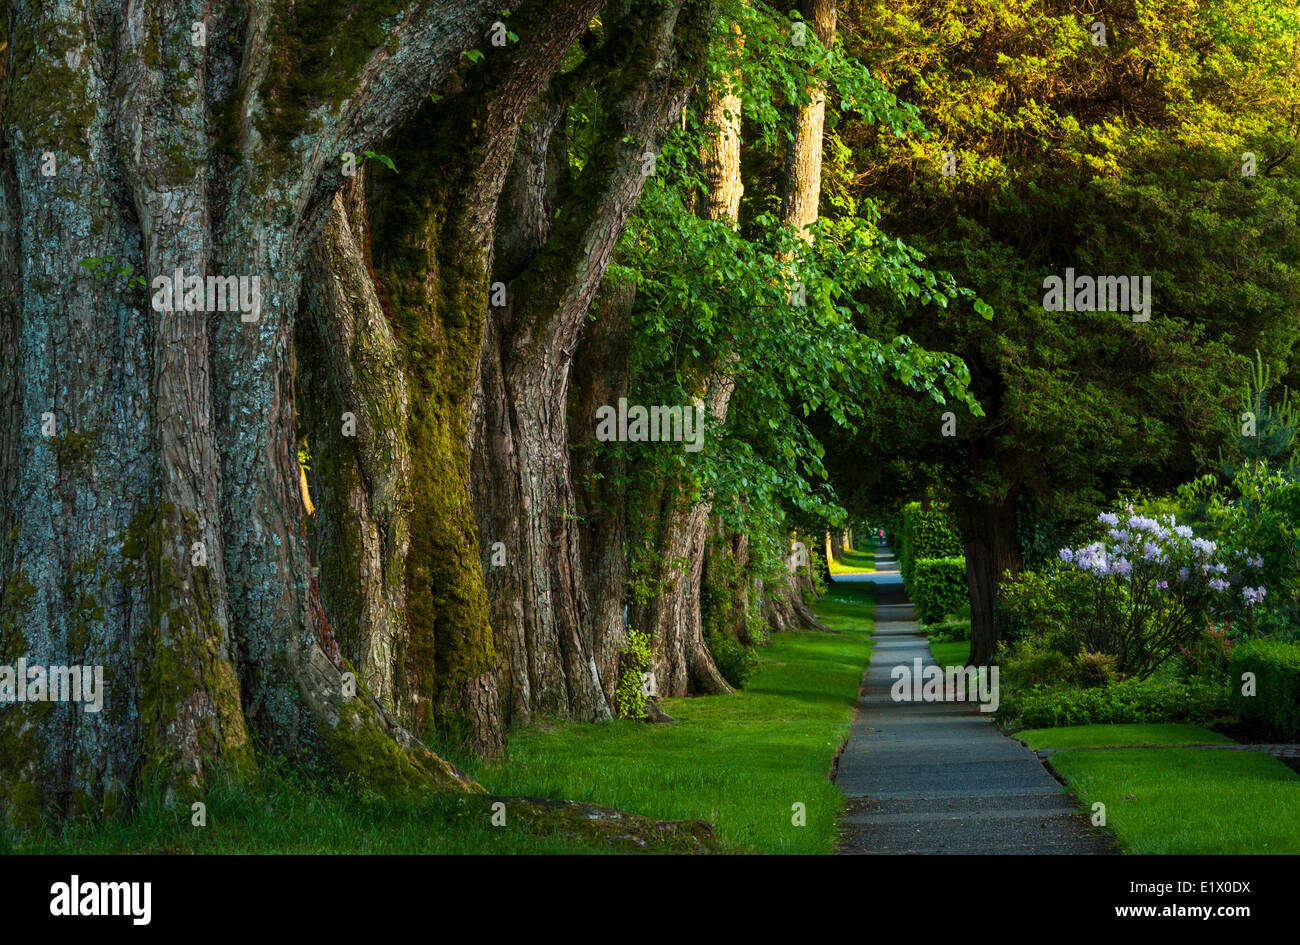 Baum gefütterte Bürgersteig, Kerrisdale, Vancouver, Britisch-Kolumbien, Kanada Stockbild